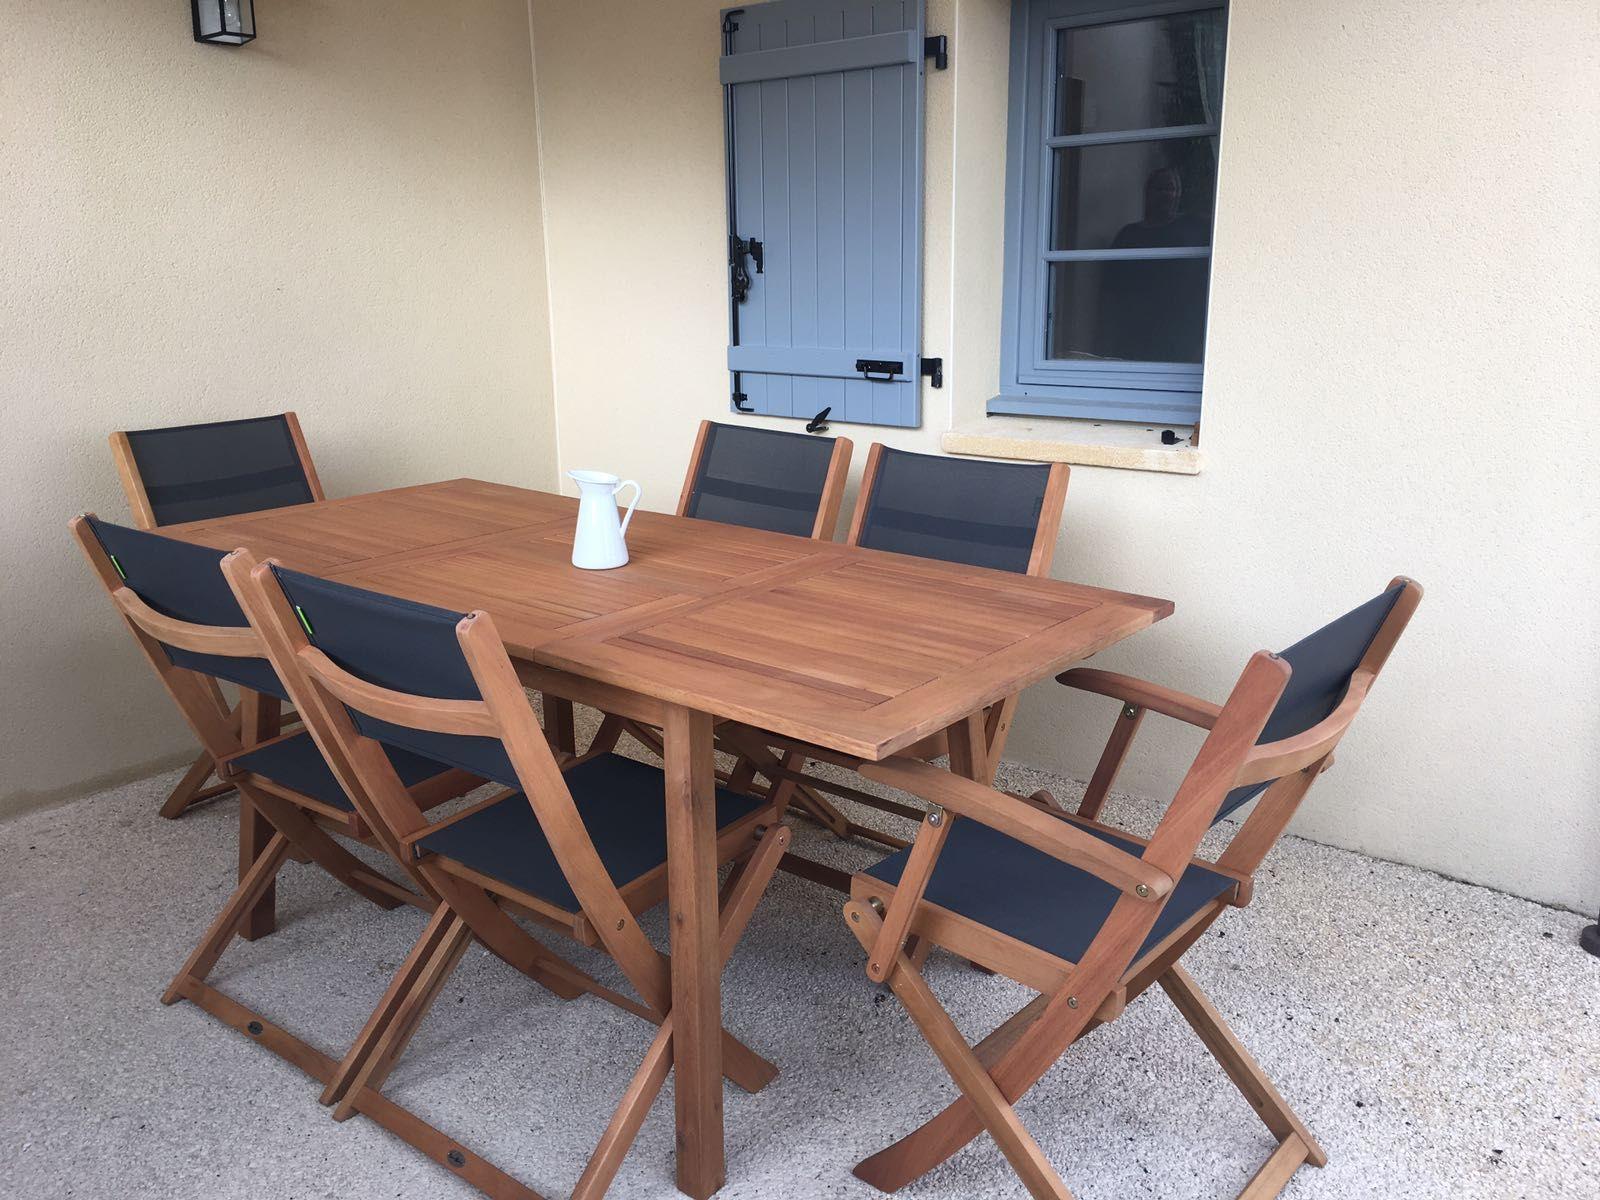 Almeria : Table de jardin en bois extensible 120-180cm, 2 ...